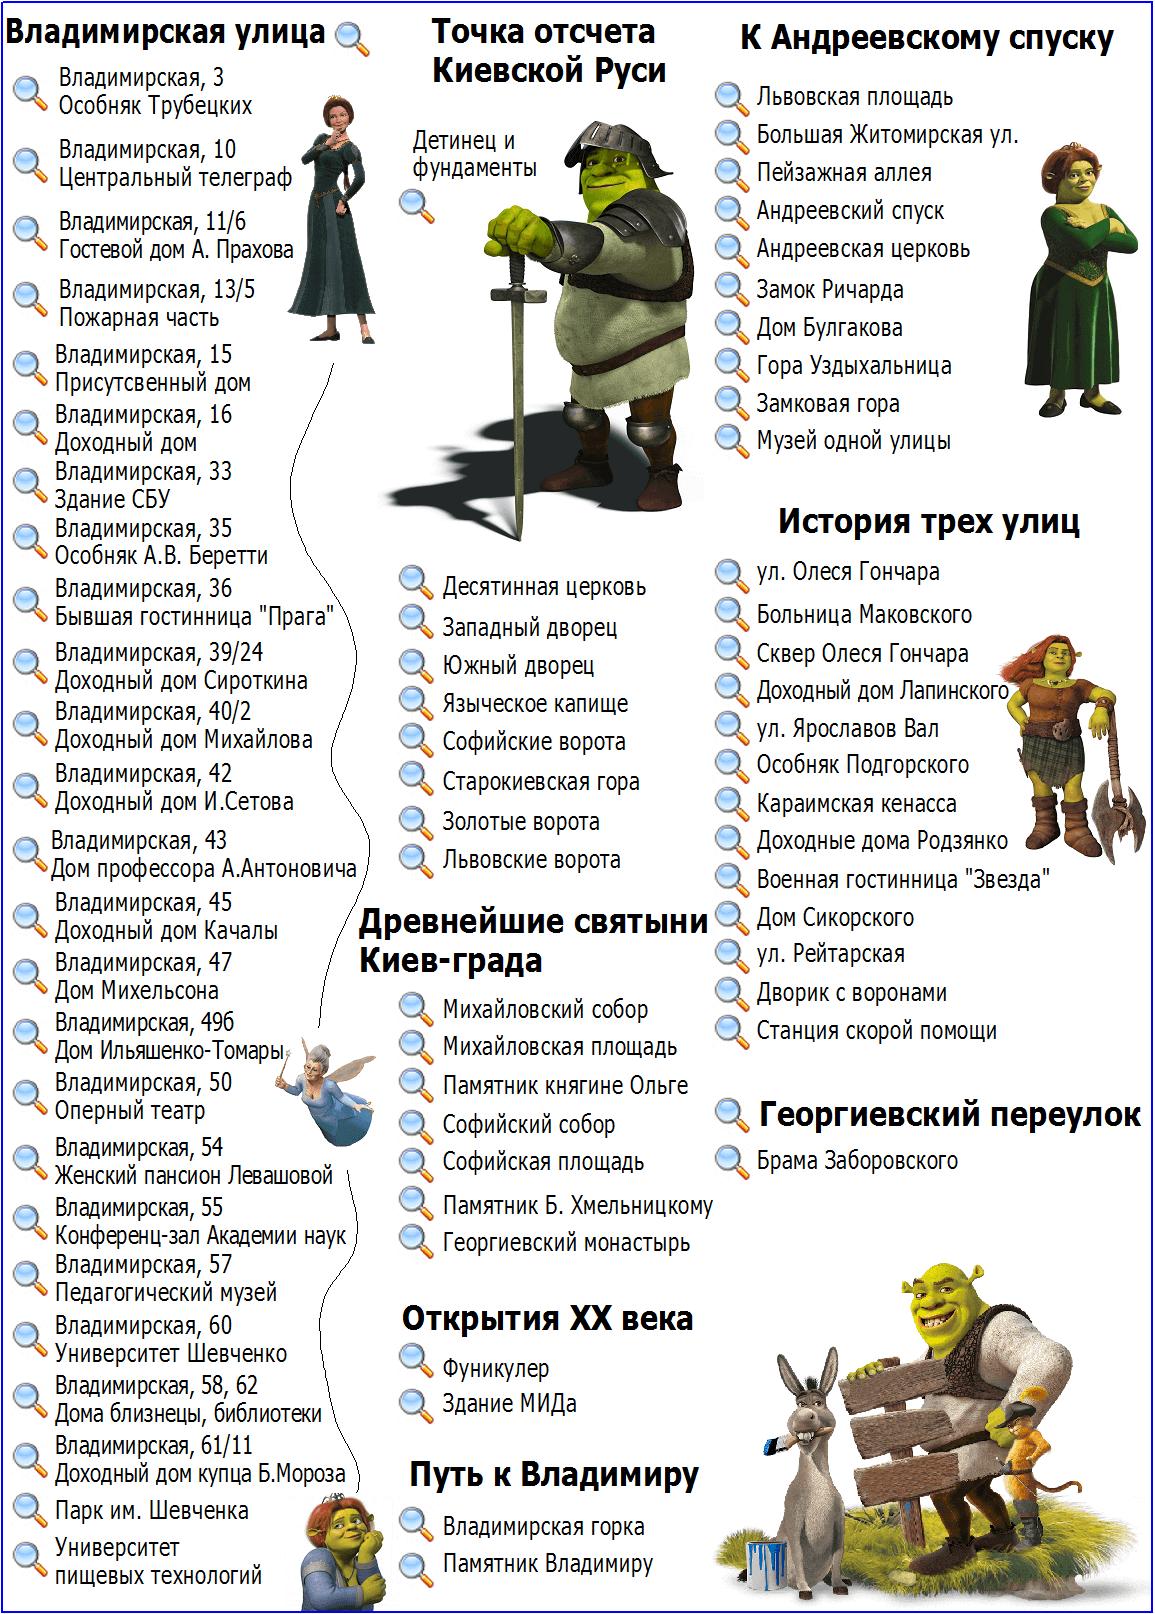 Старый (Верхний) город Киев